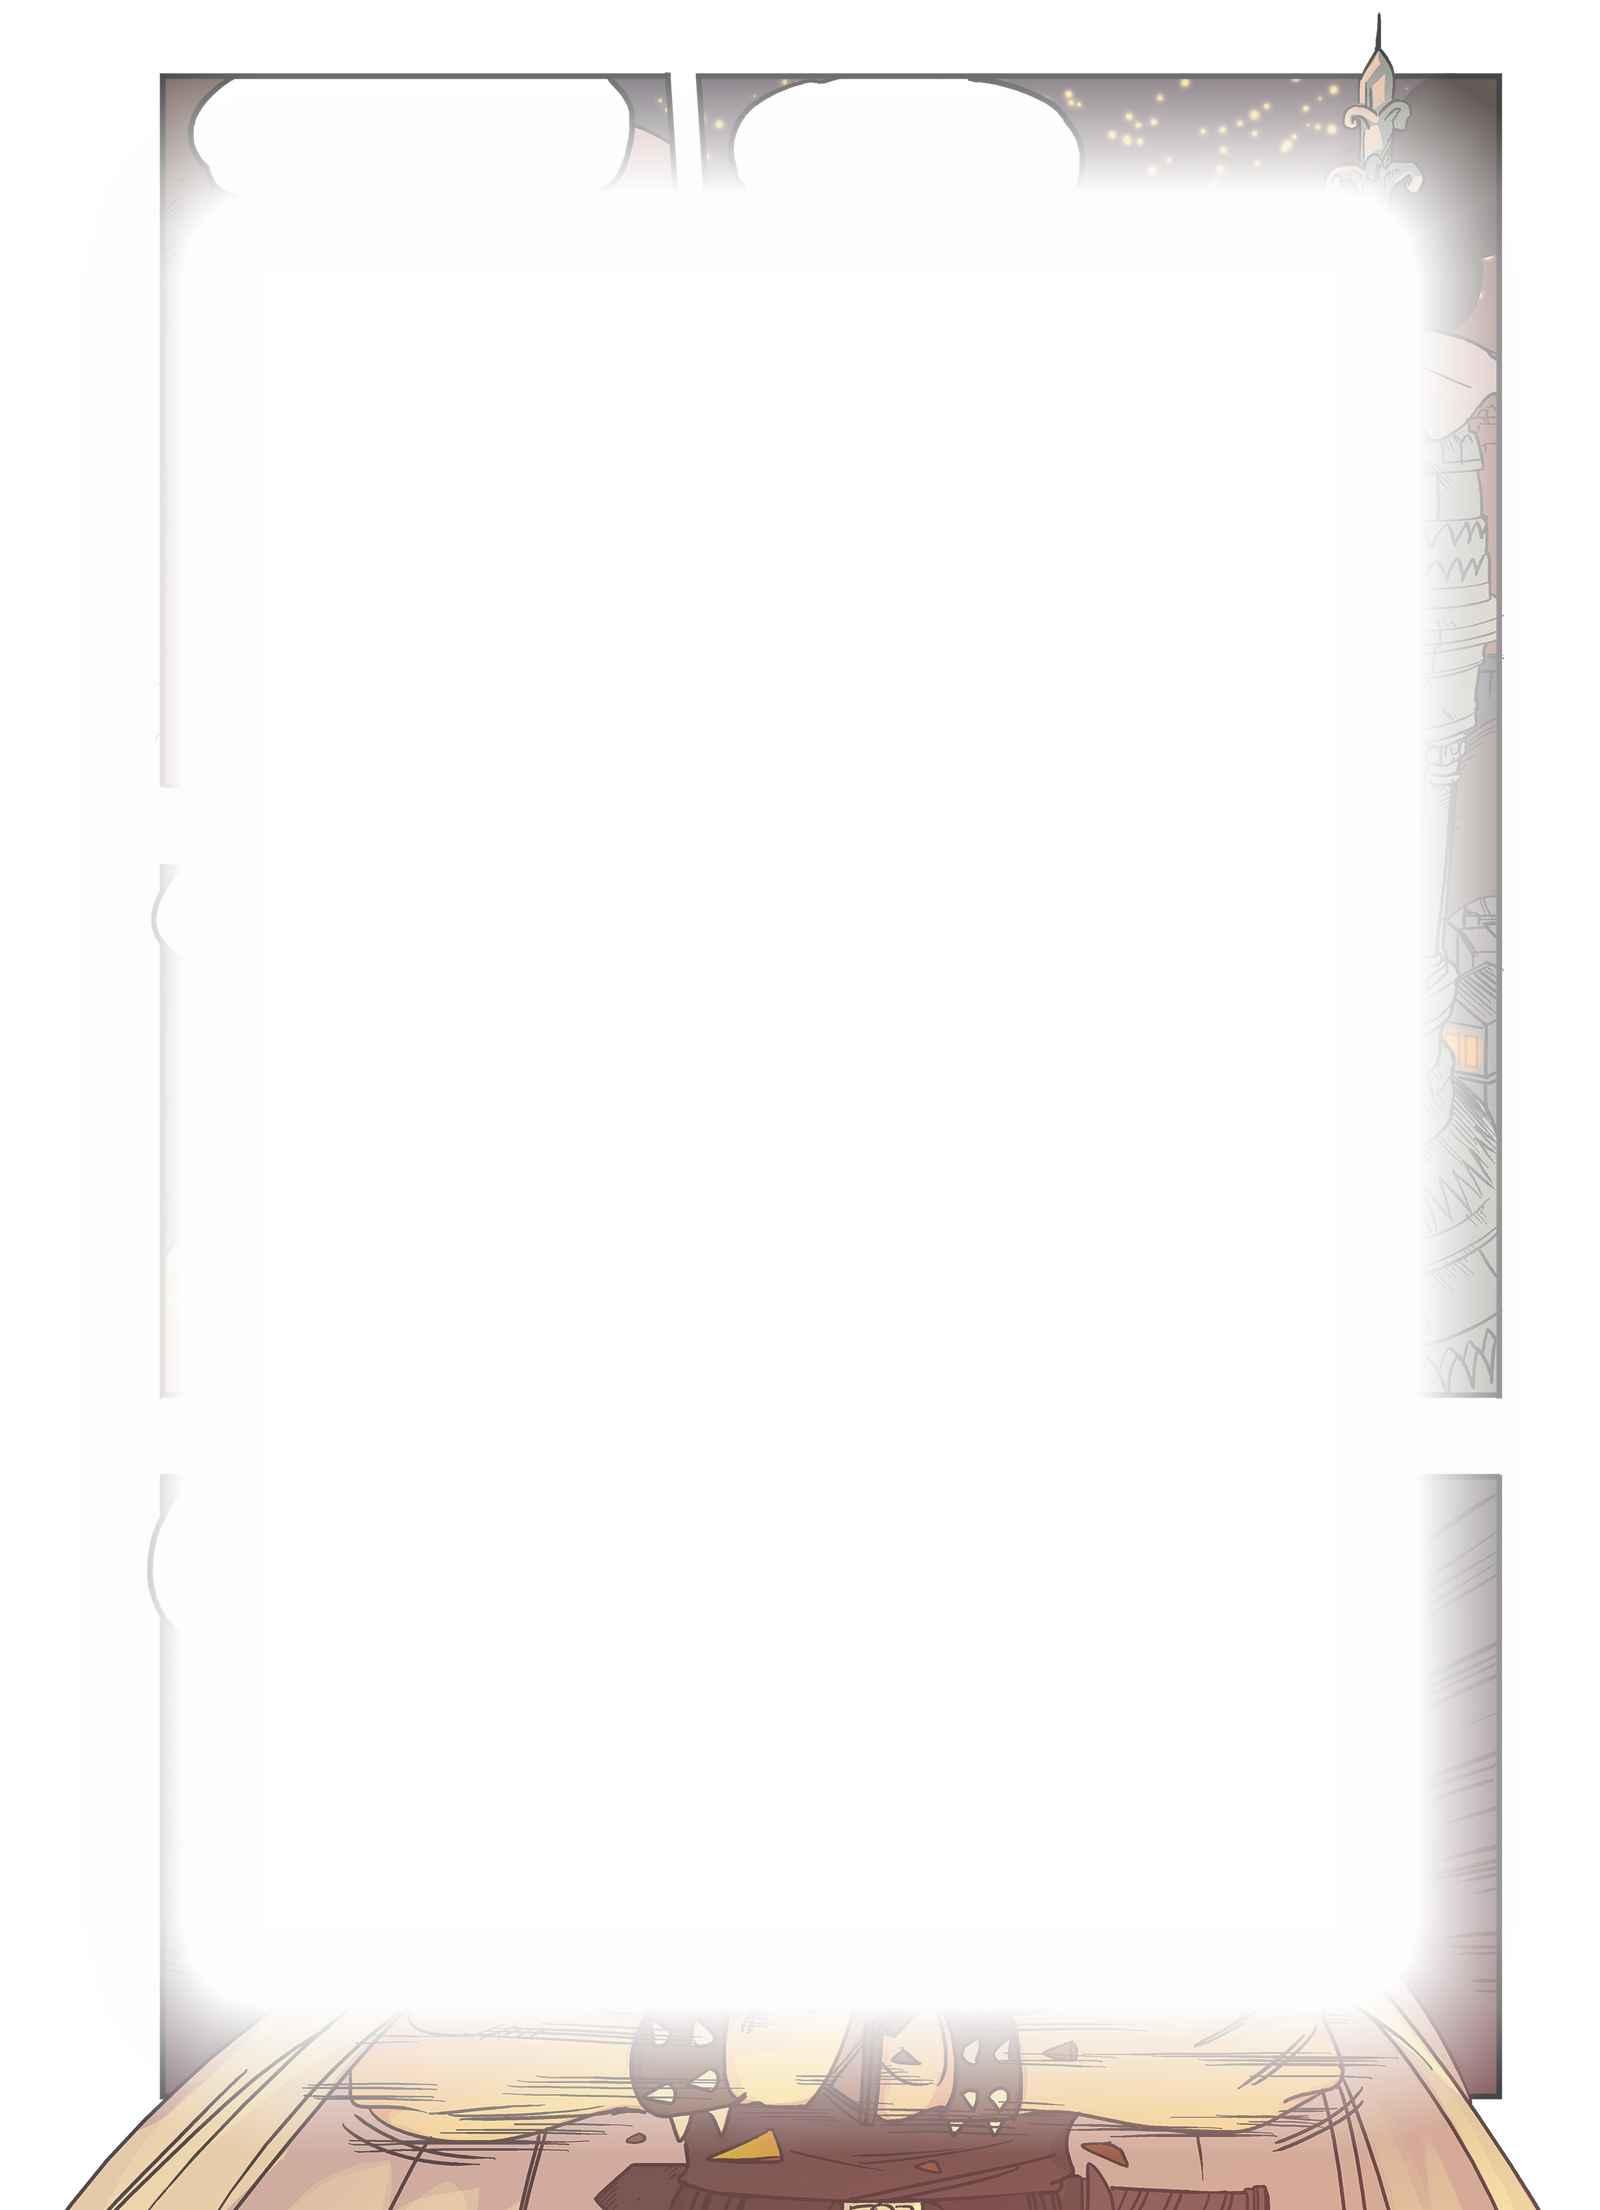 Amilova : Chapitre 7 page 3